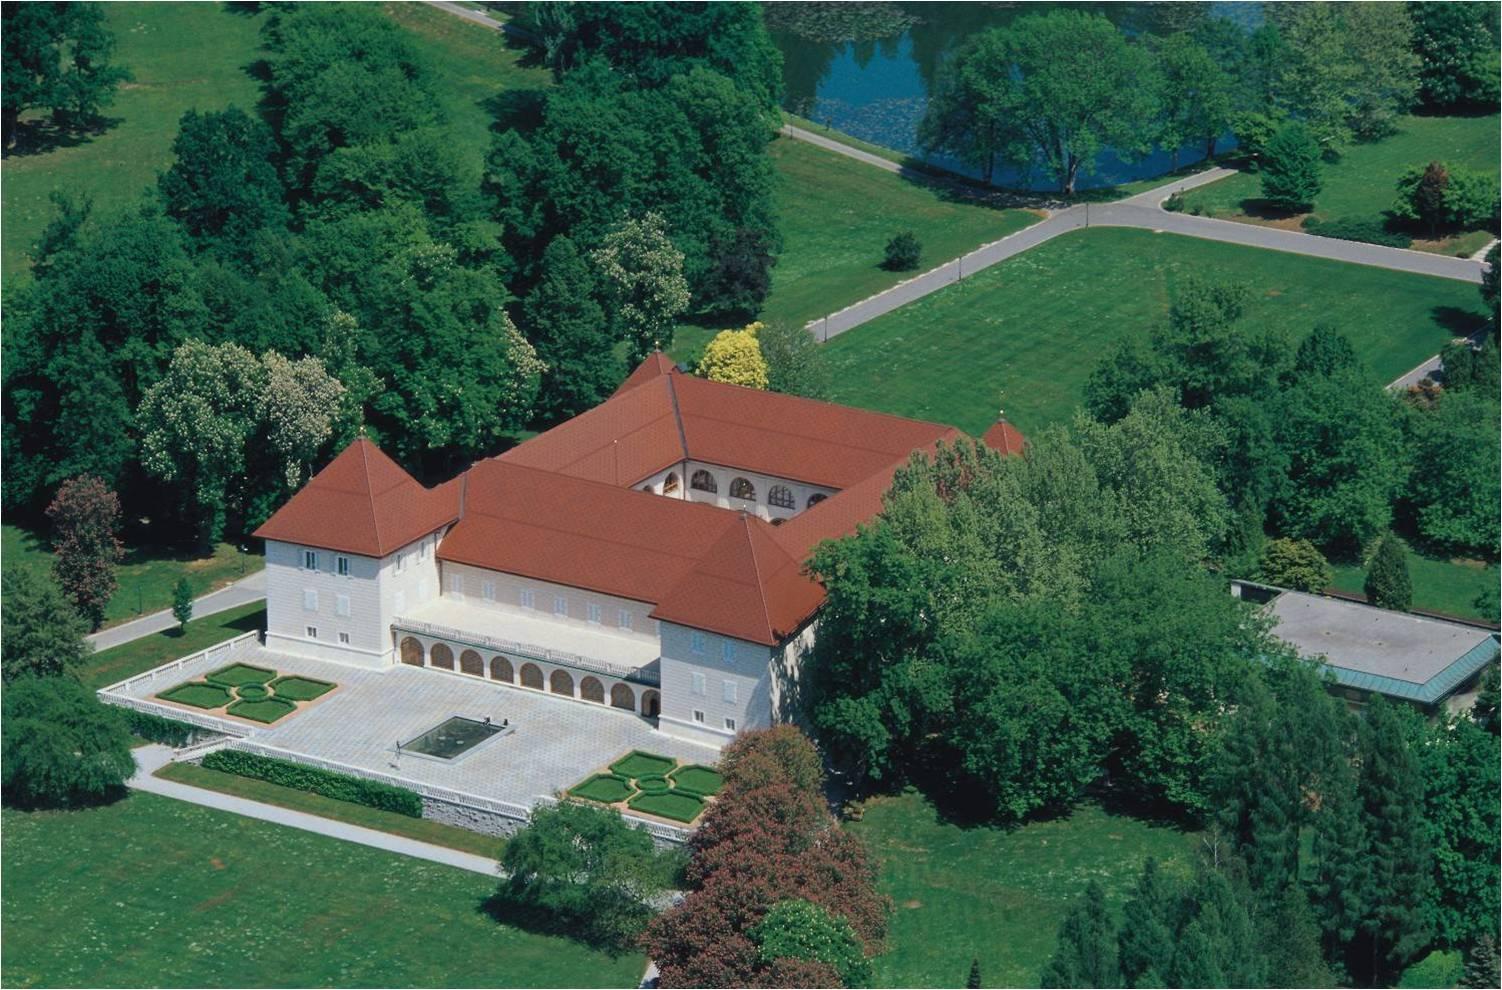 Castelul Brdo - Slovenia TONDACH - Poza 2